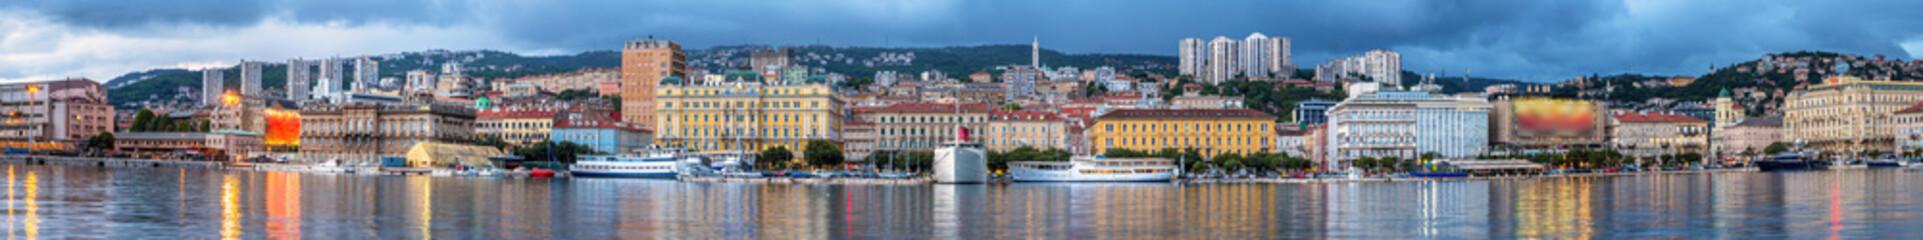 Panorama of Rijeka city in Croatia